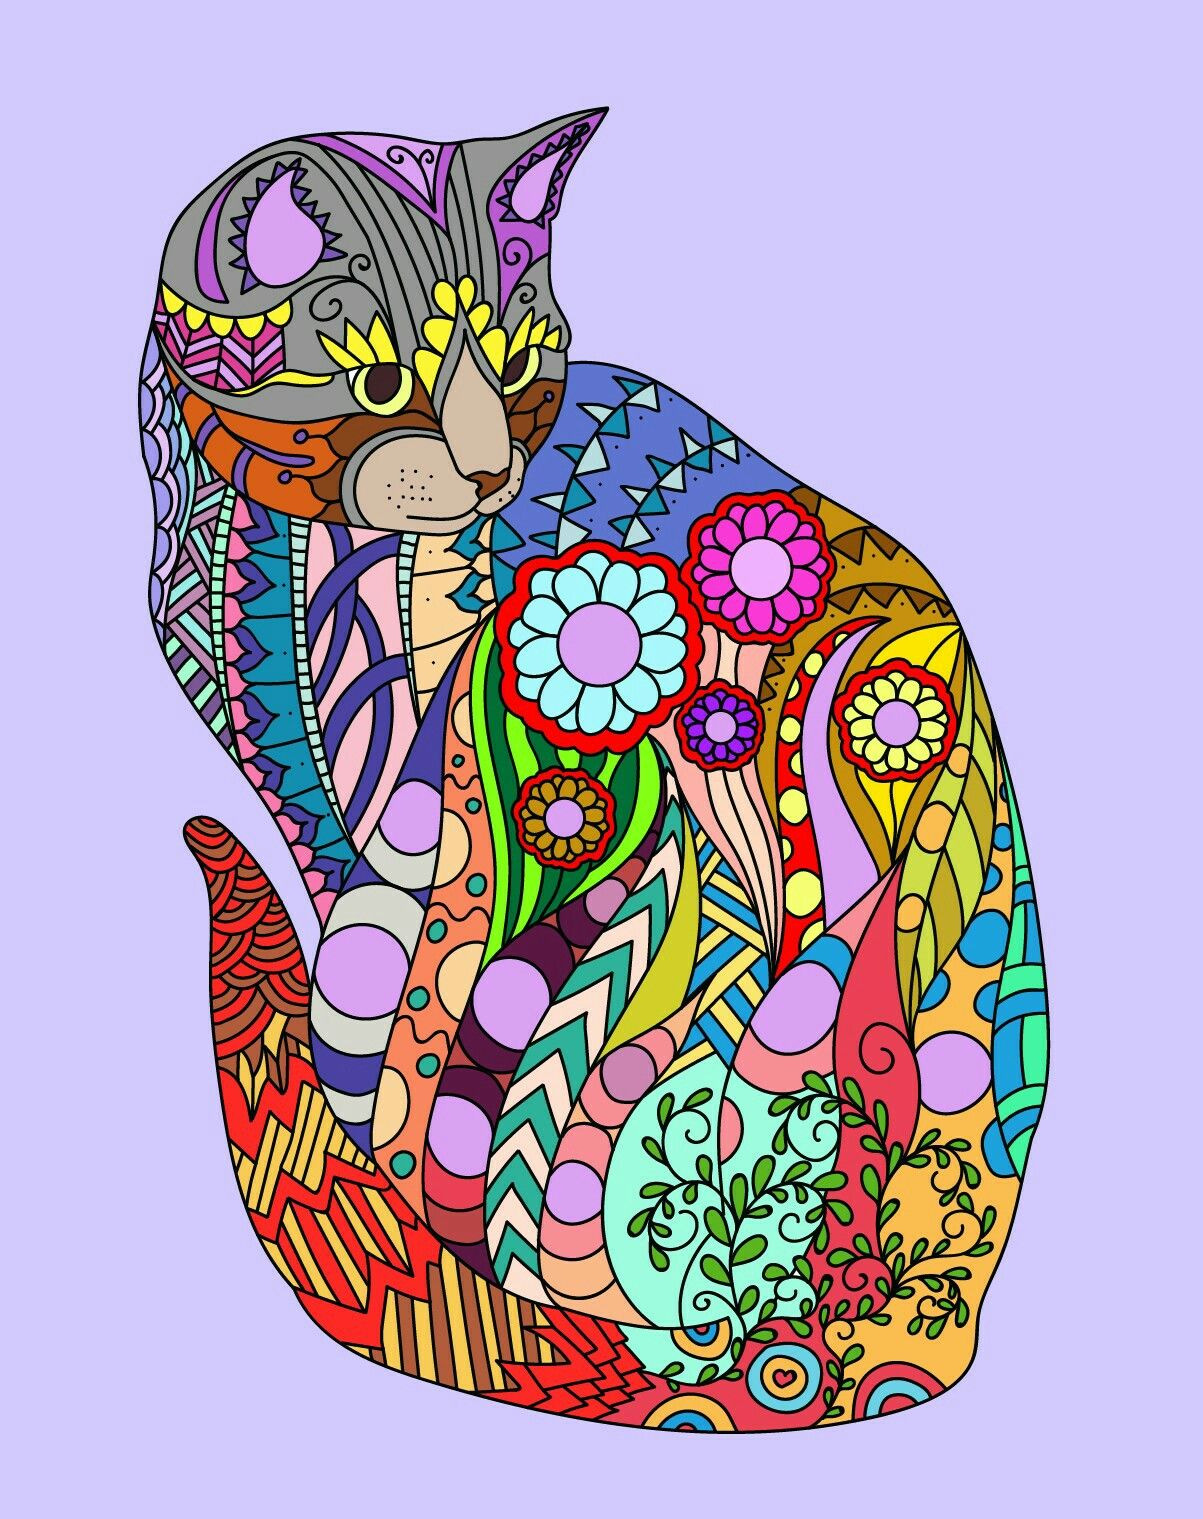 Pin By Mere On Design Decor Cat Art Print Cat Painting Cat Art [ 1519 x 1203 Pixel ]